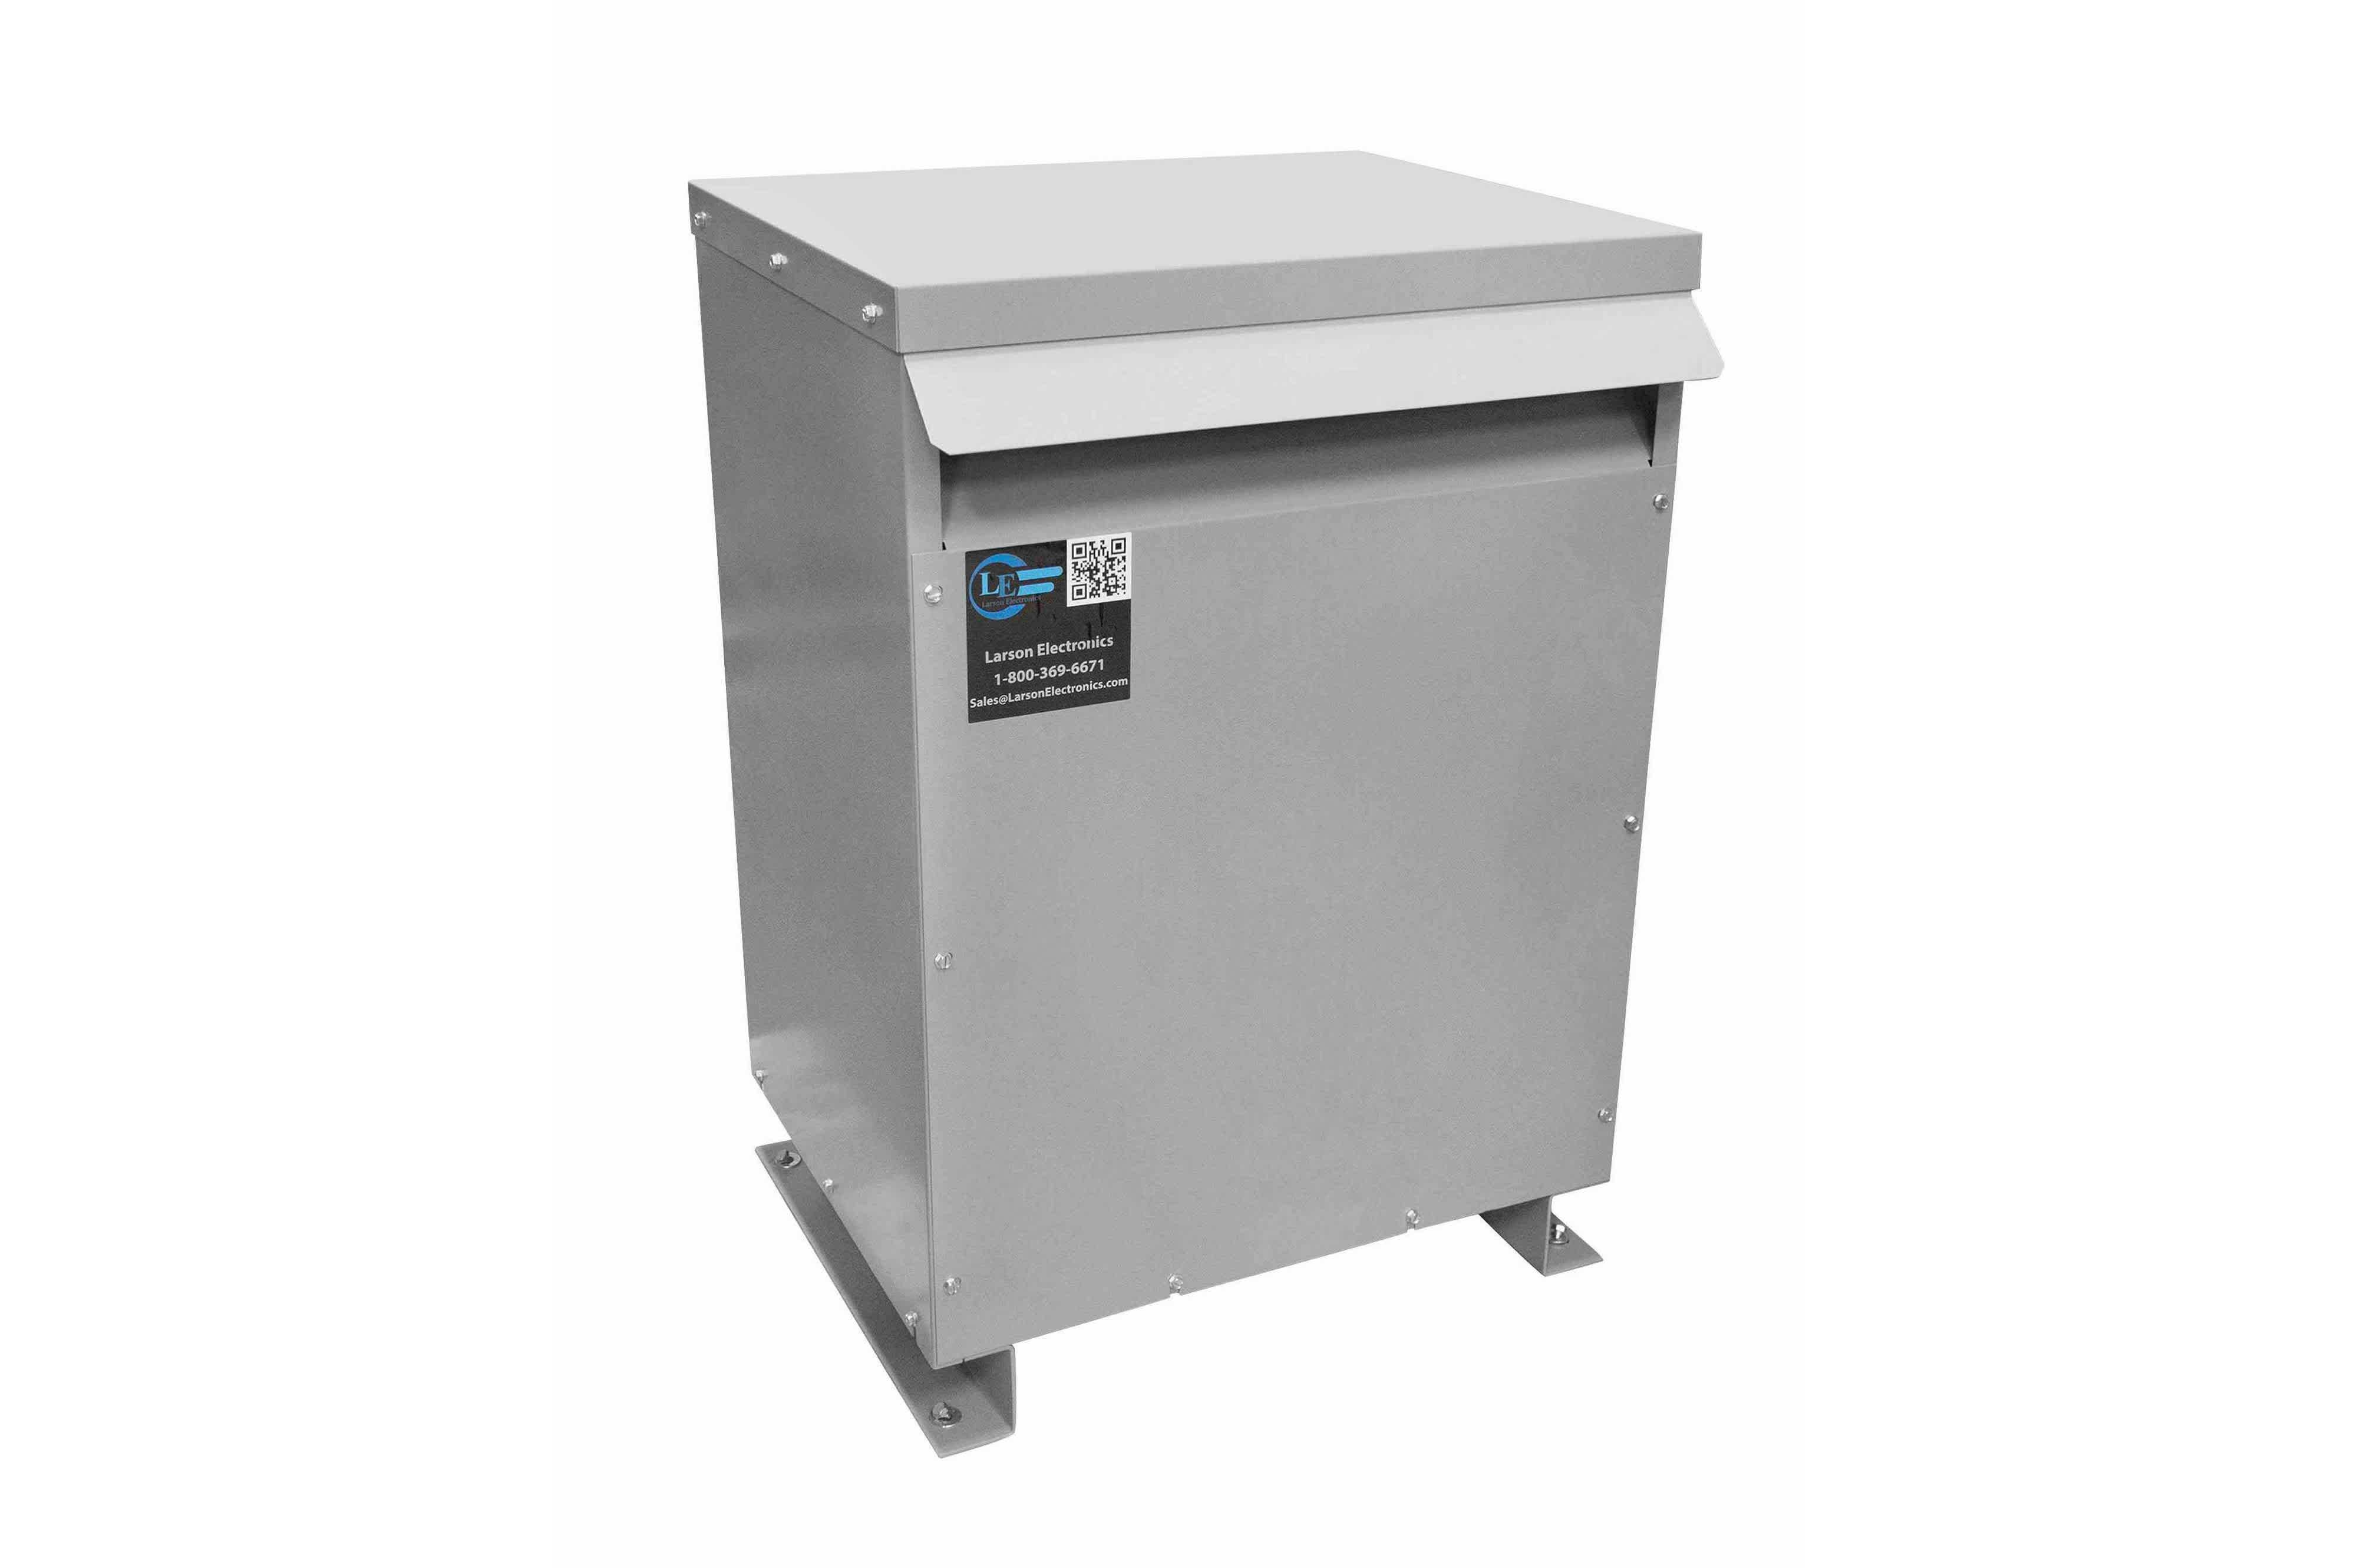 900 kVA 3PH Isolation Transformer, 240V Wye Primary, 415V Delta Secondary, N3R, Ventilated, 60 Hz